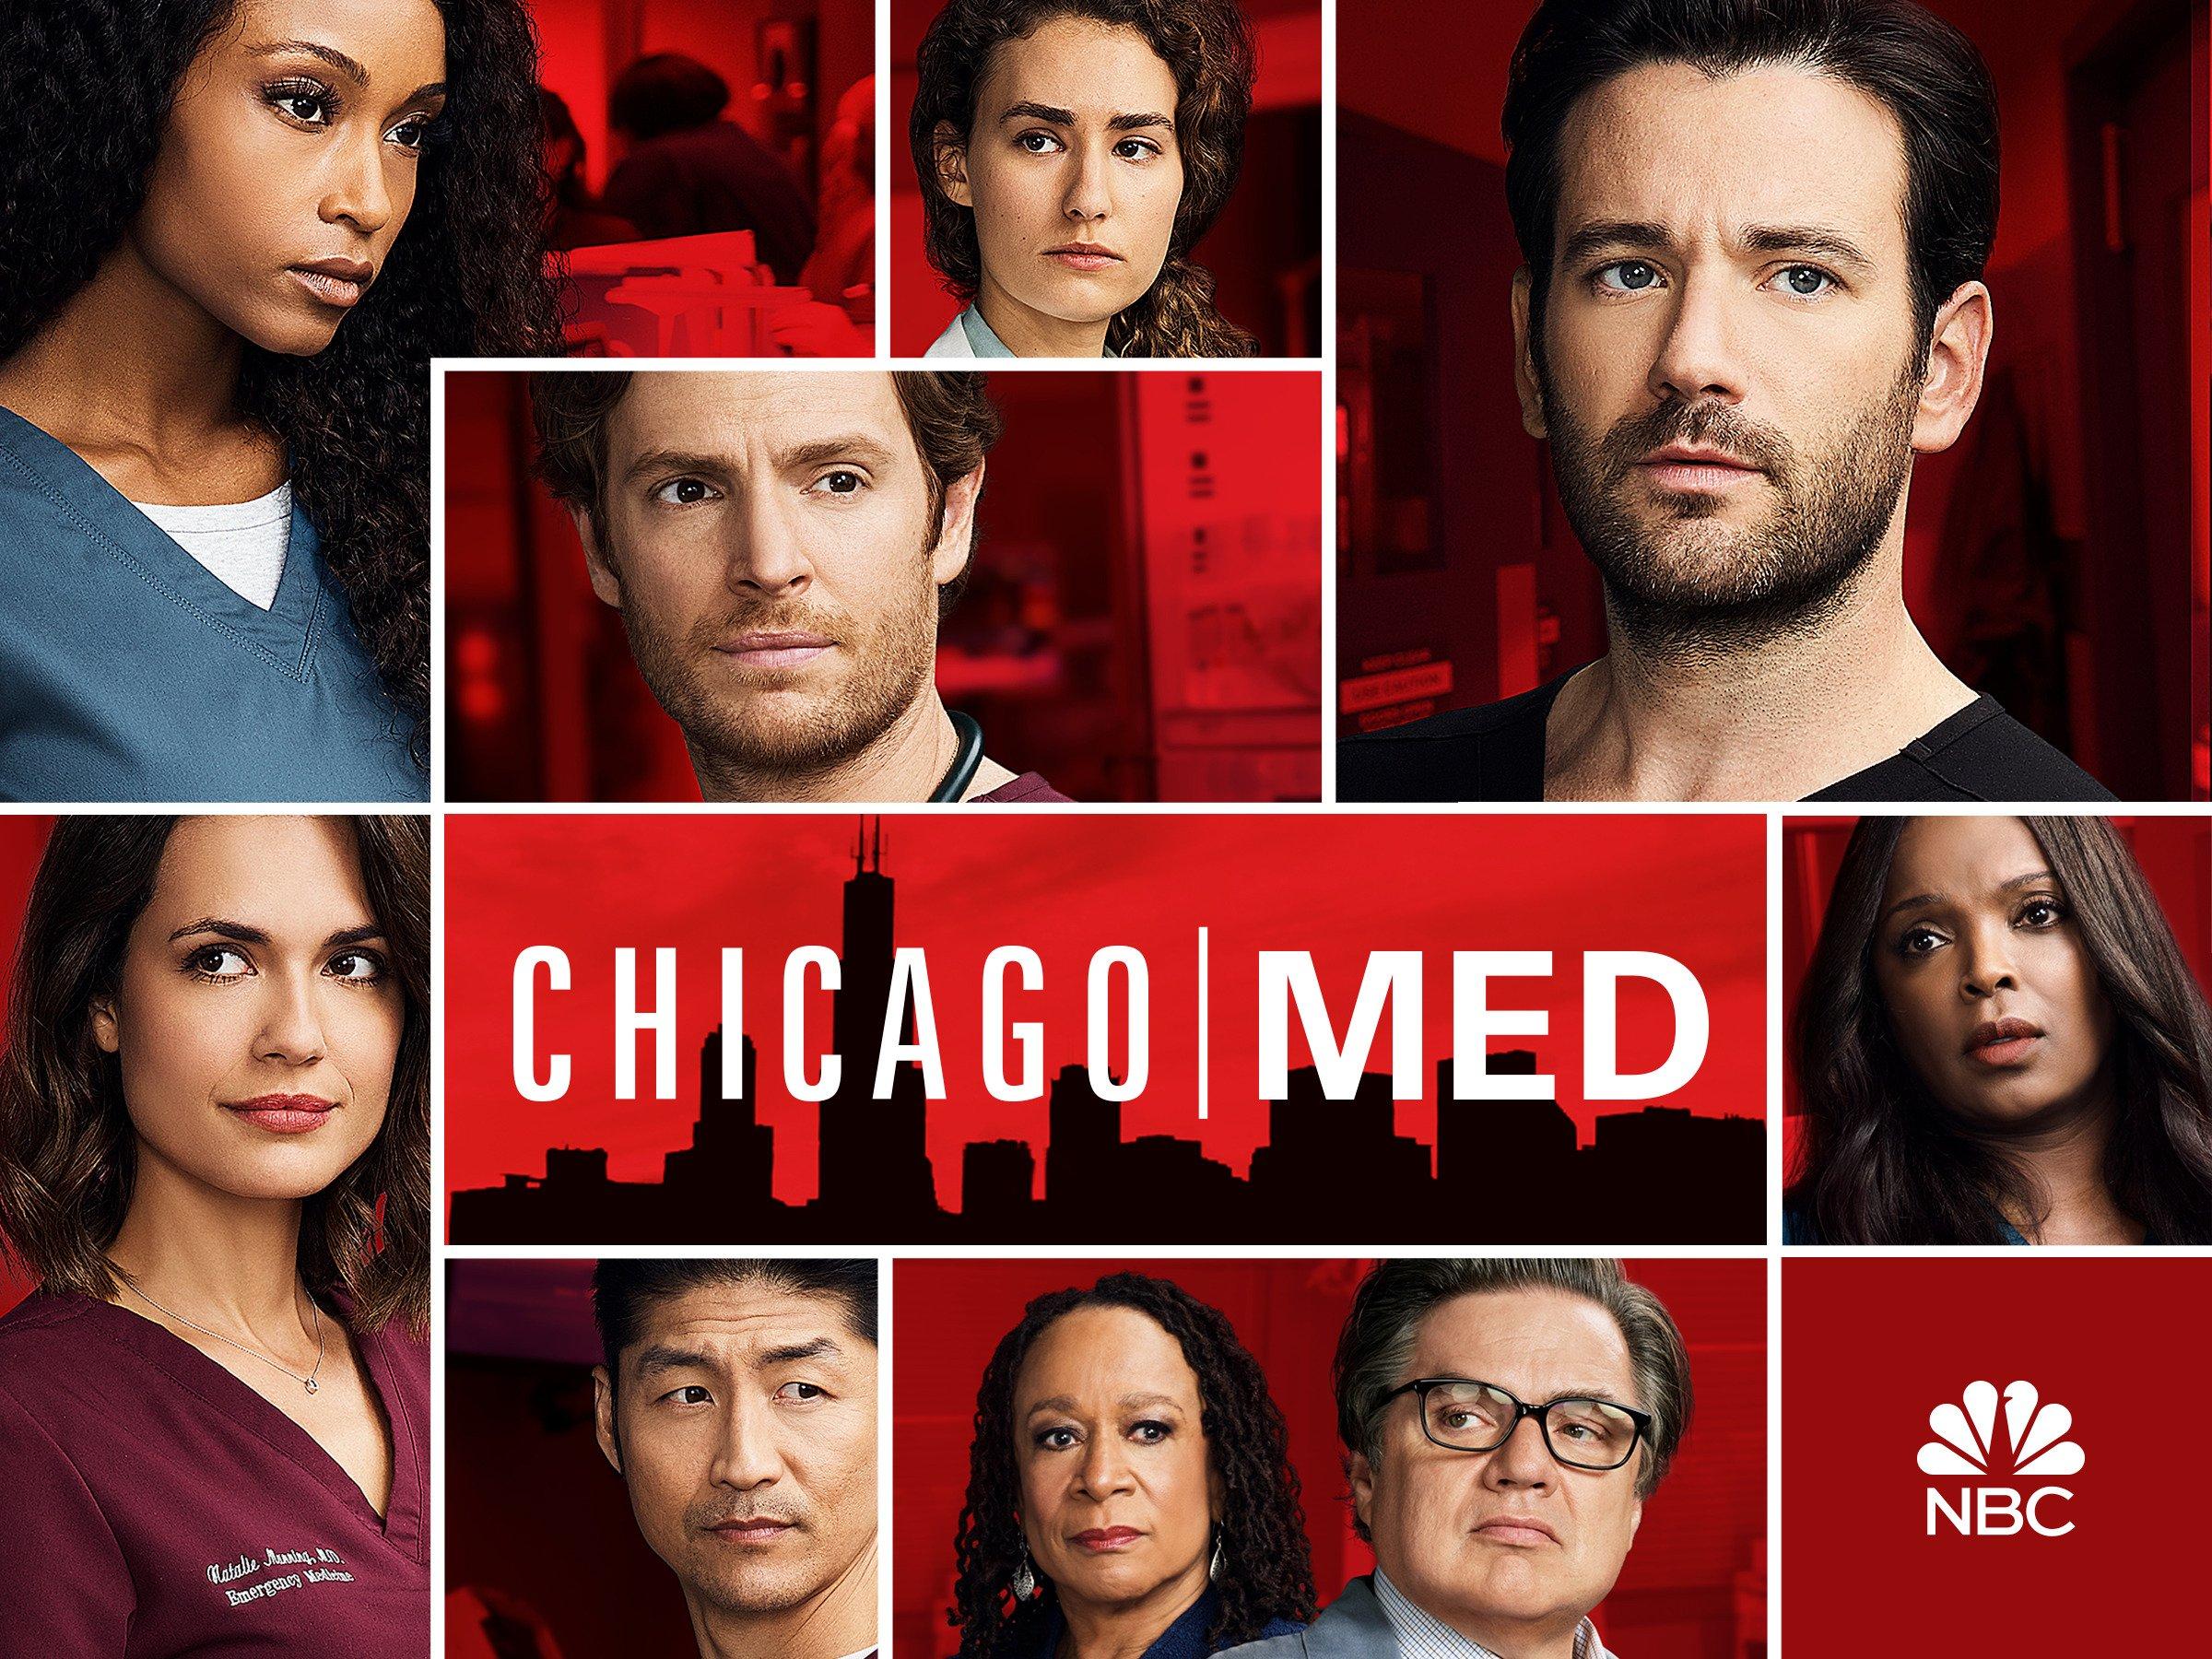 chicago med season 3 watch online free